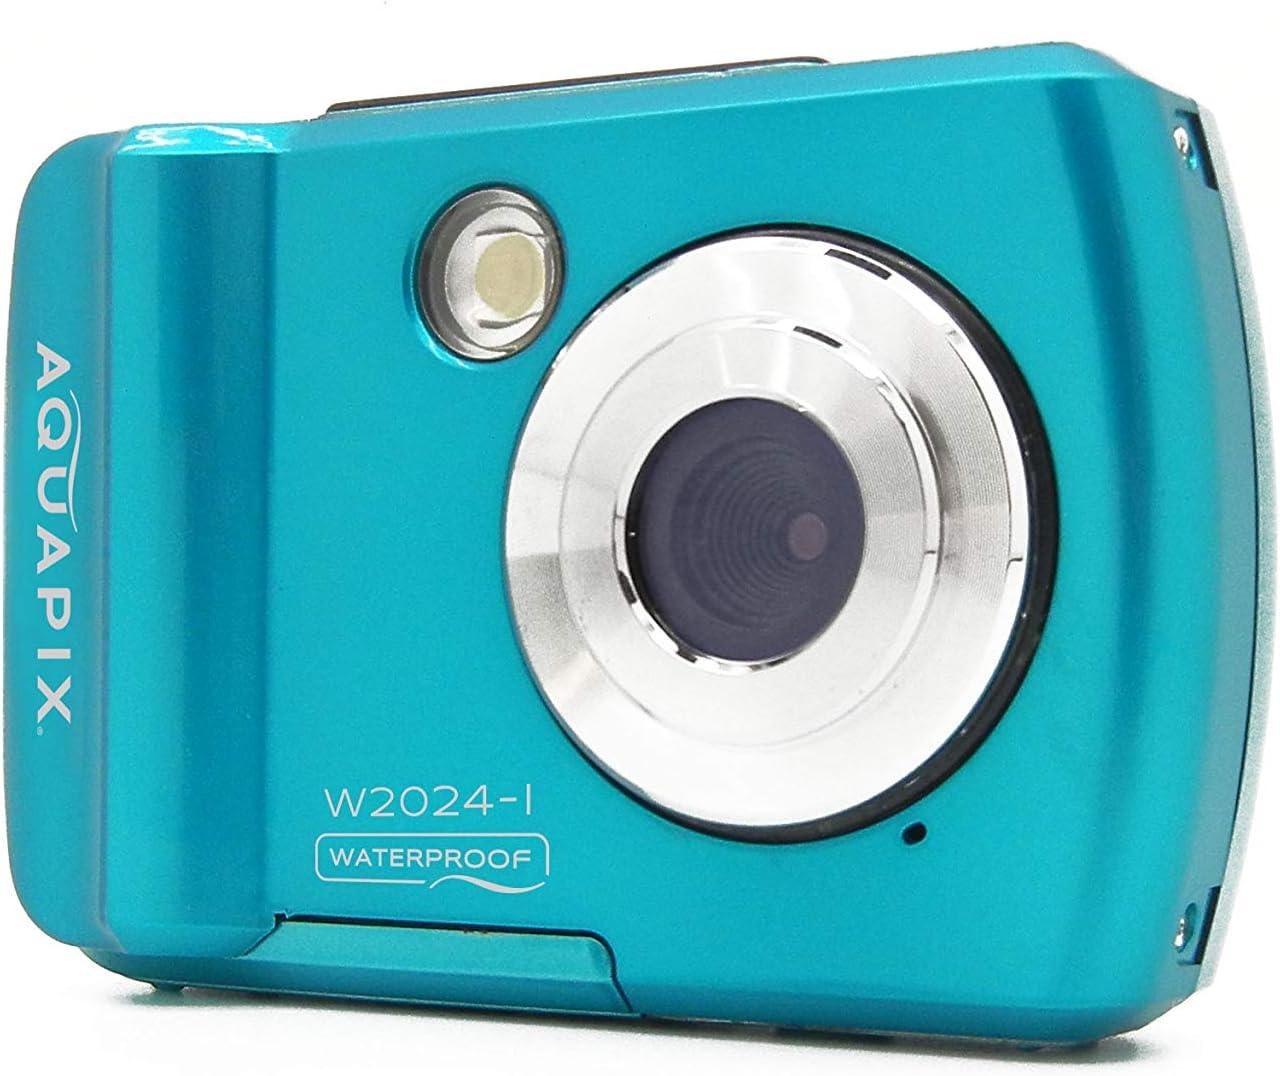 Easypix EASYPIX W2024-I Splash Iceblue Cam/éra Submersible 14 MP Double Pente Bleu